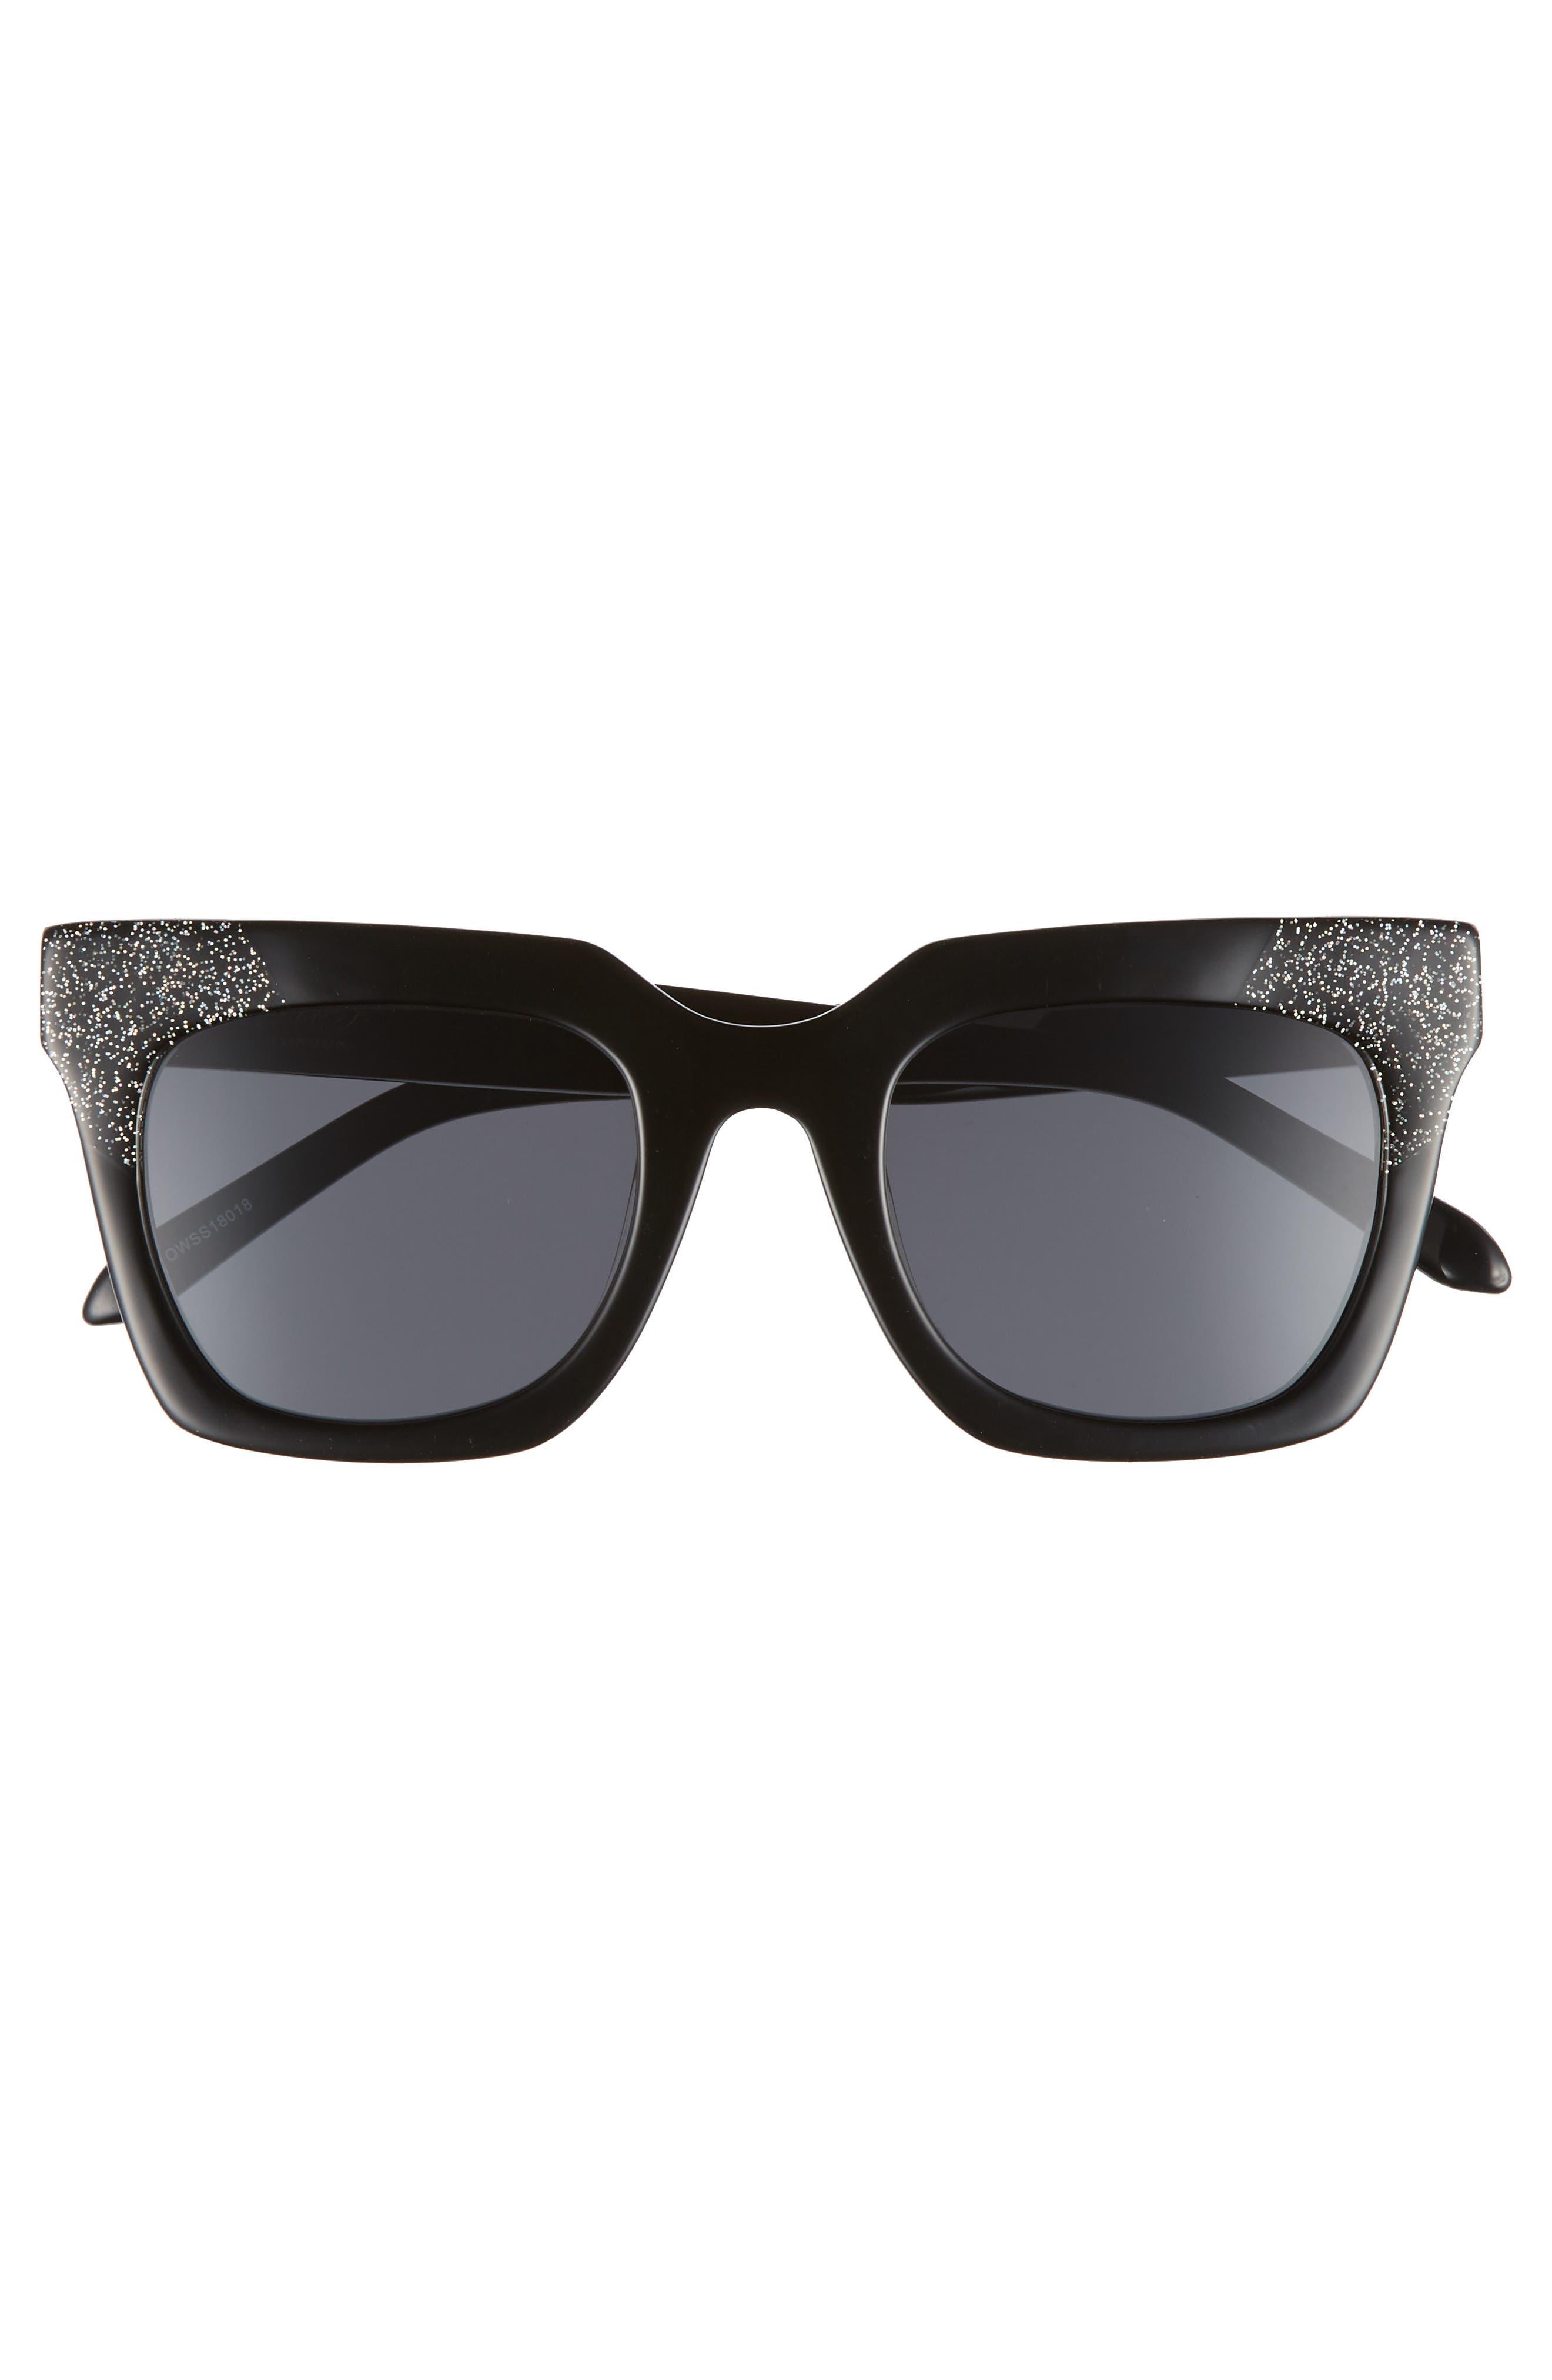 Riley 50mm Cat Eye Sunglasses,                             Alternate thumbnail 3, color,                             BLACK/ SMOKE